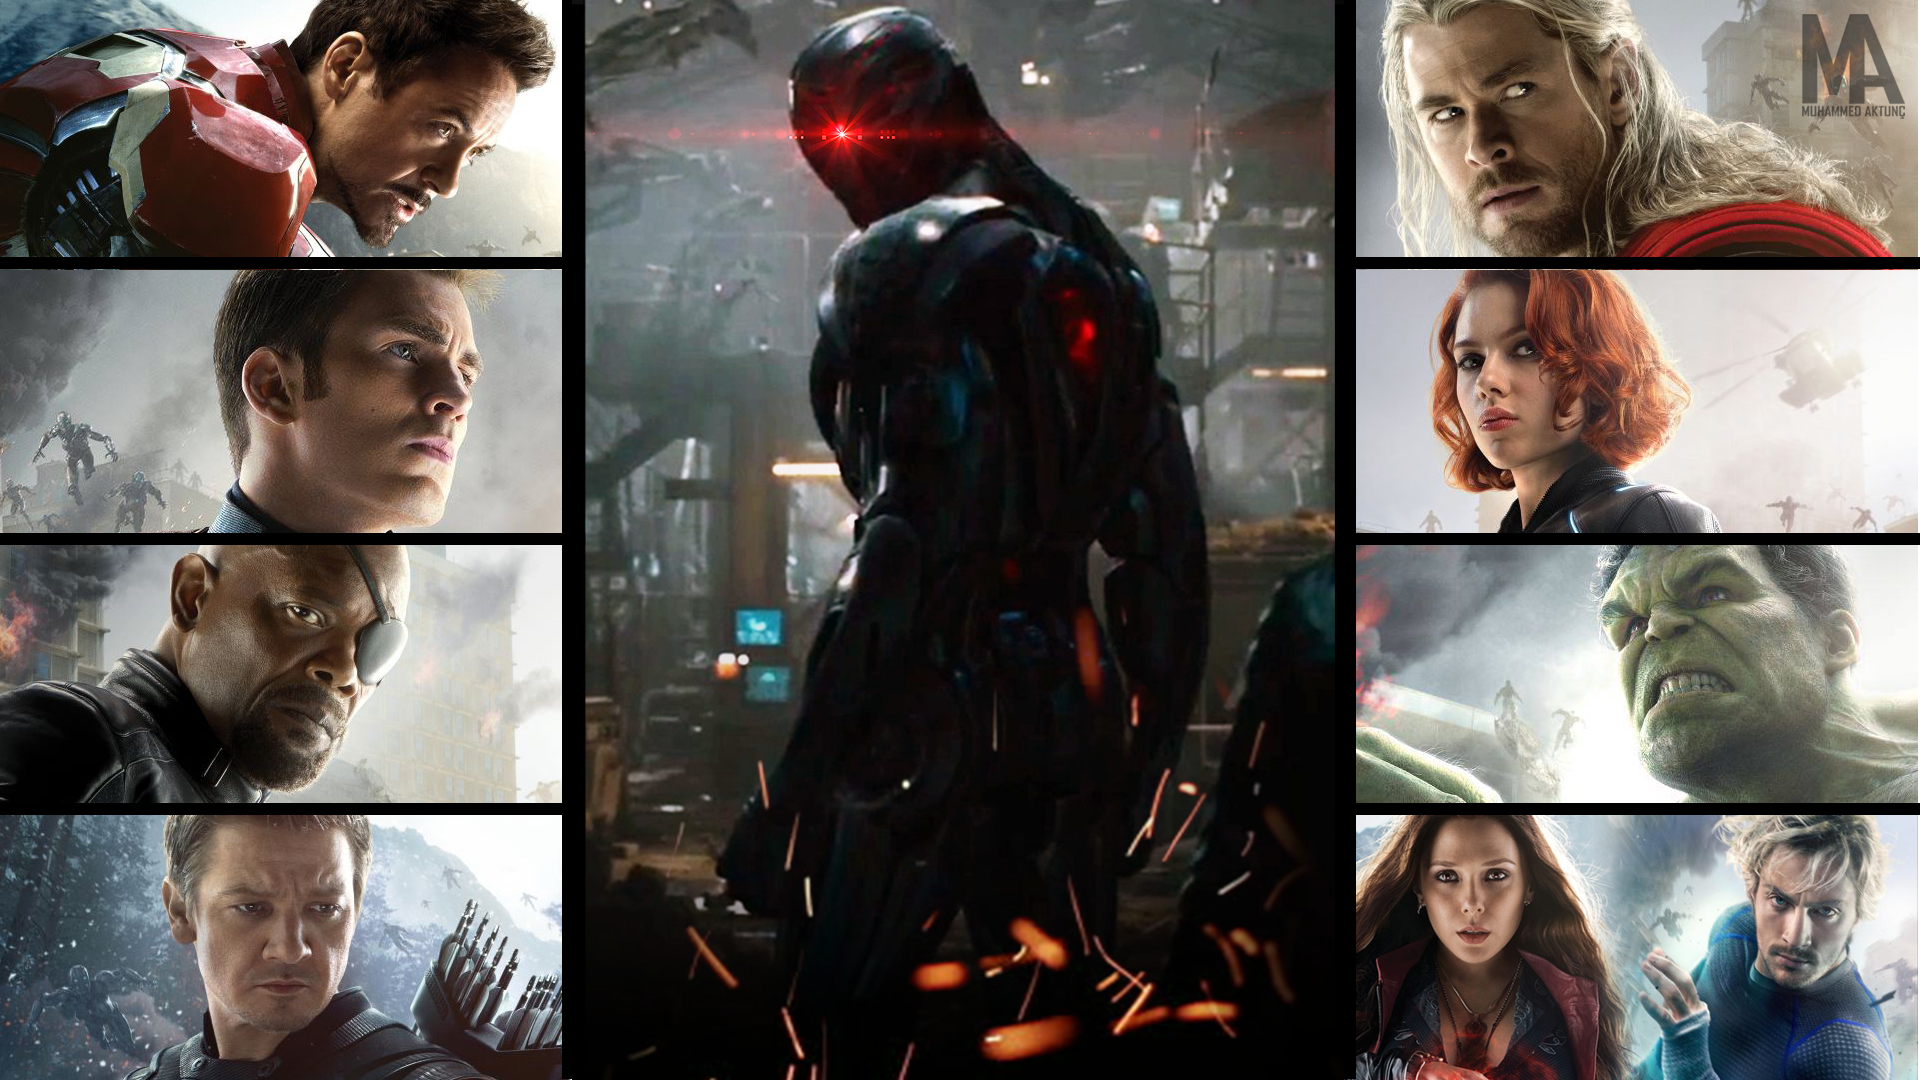 Most Inspiring Wallpaper Marvel Avengers Age Ultron - marvel_s_avengers__age_of_ultron_hd_wallpaper_by_muhammedaktunc-d8lsc1p  Trends_38549.png